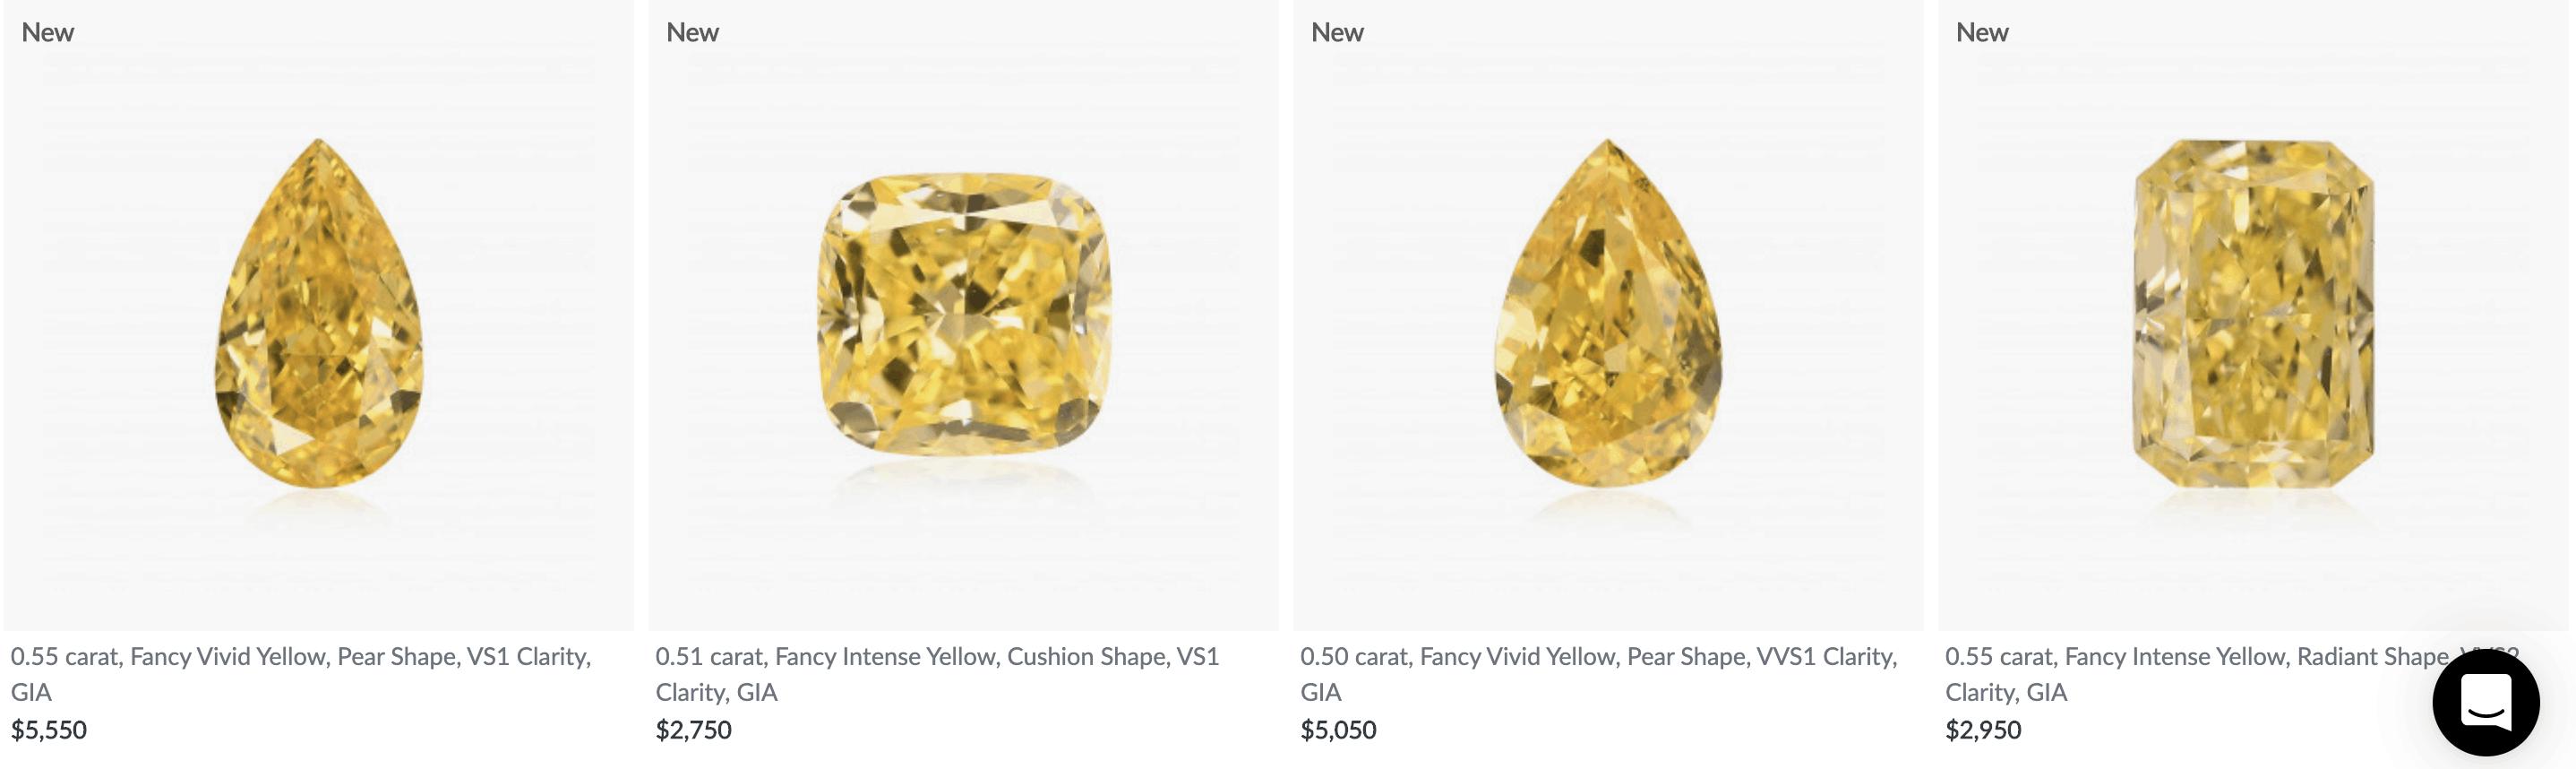 Canary Yellow Diamonds